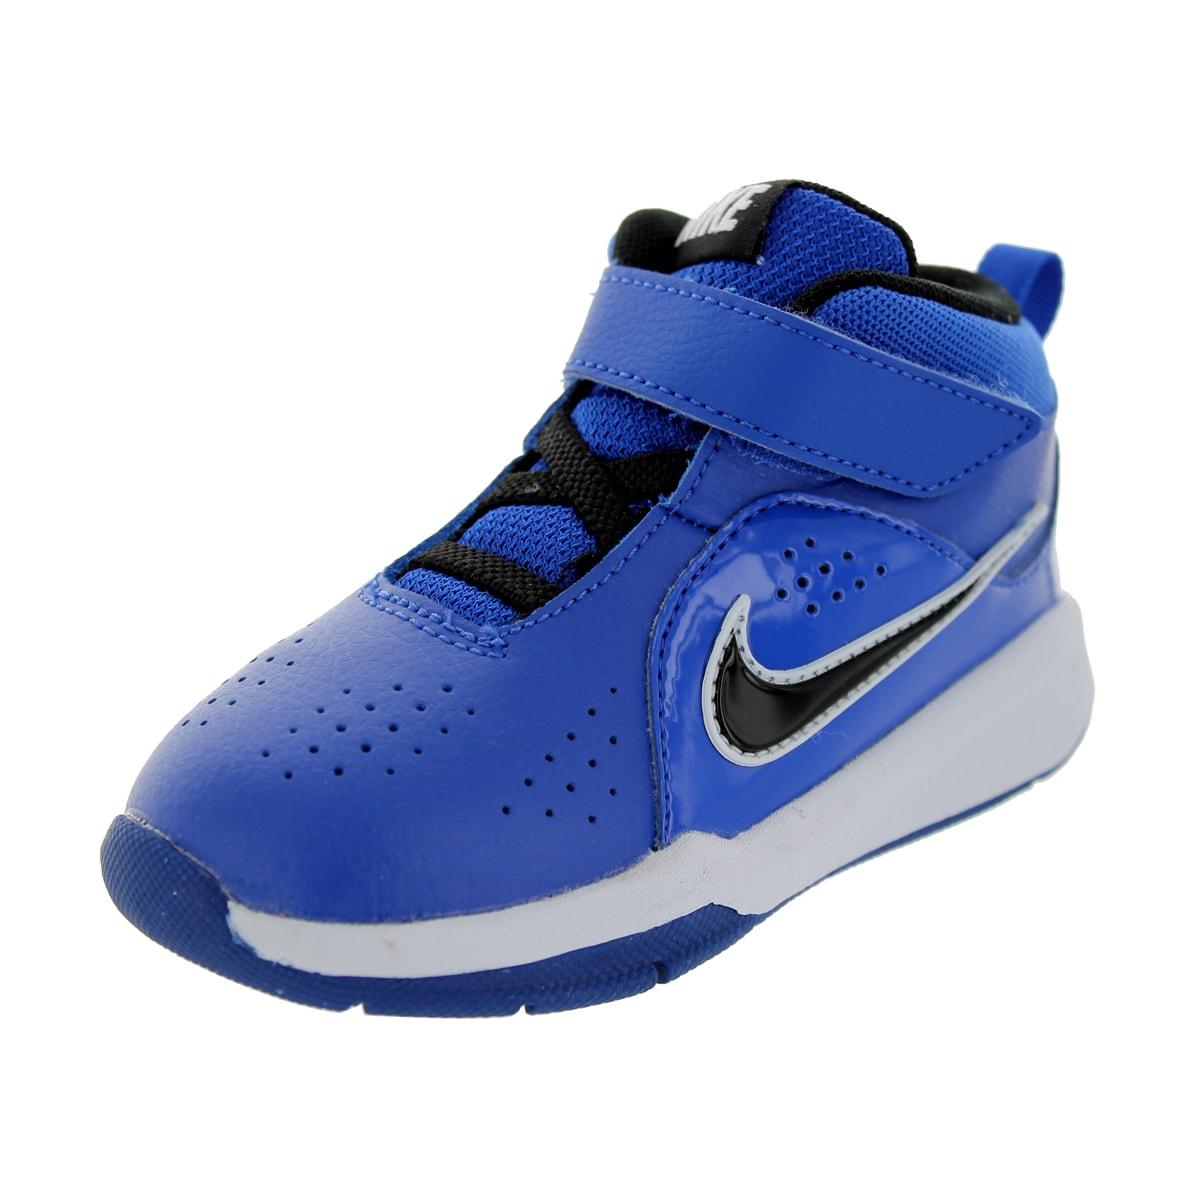 Nike Toddlers' Team Huse D 6 (TD) Game Royal/Black/Game R...